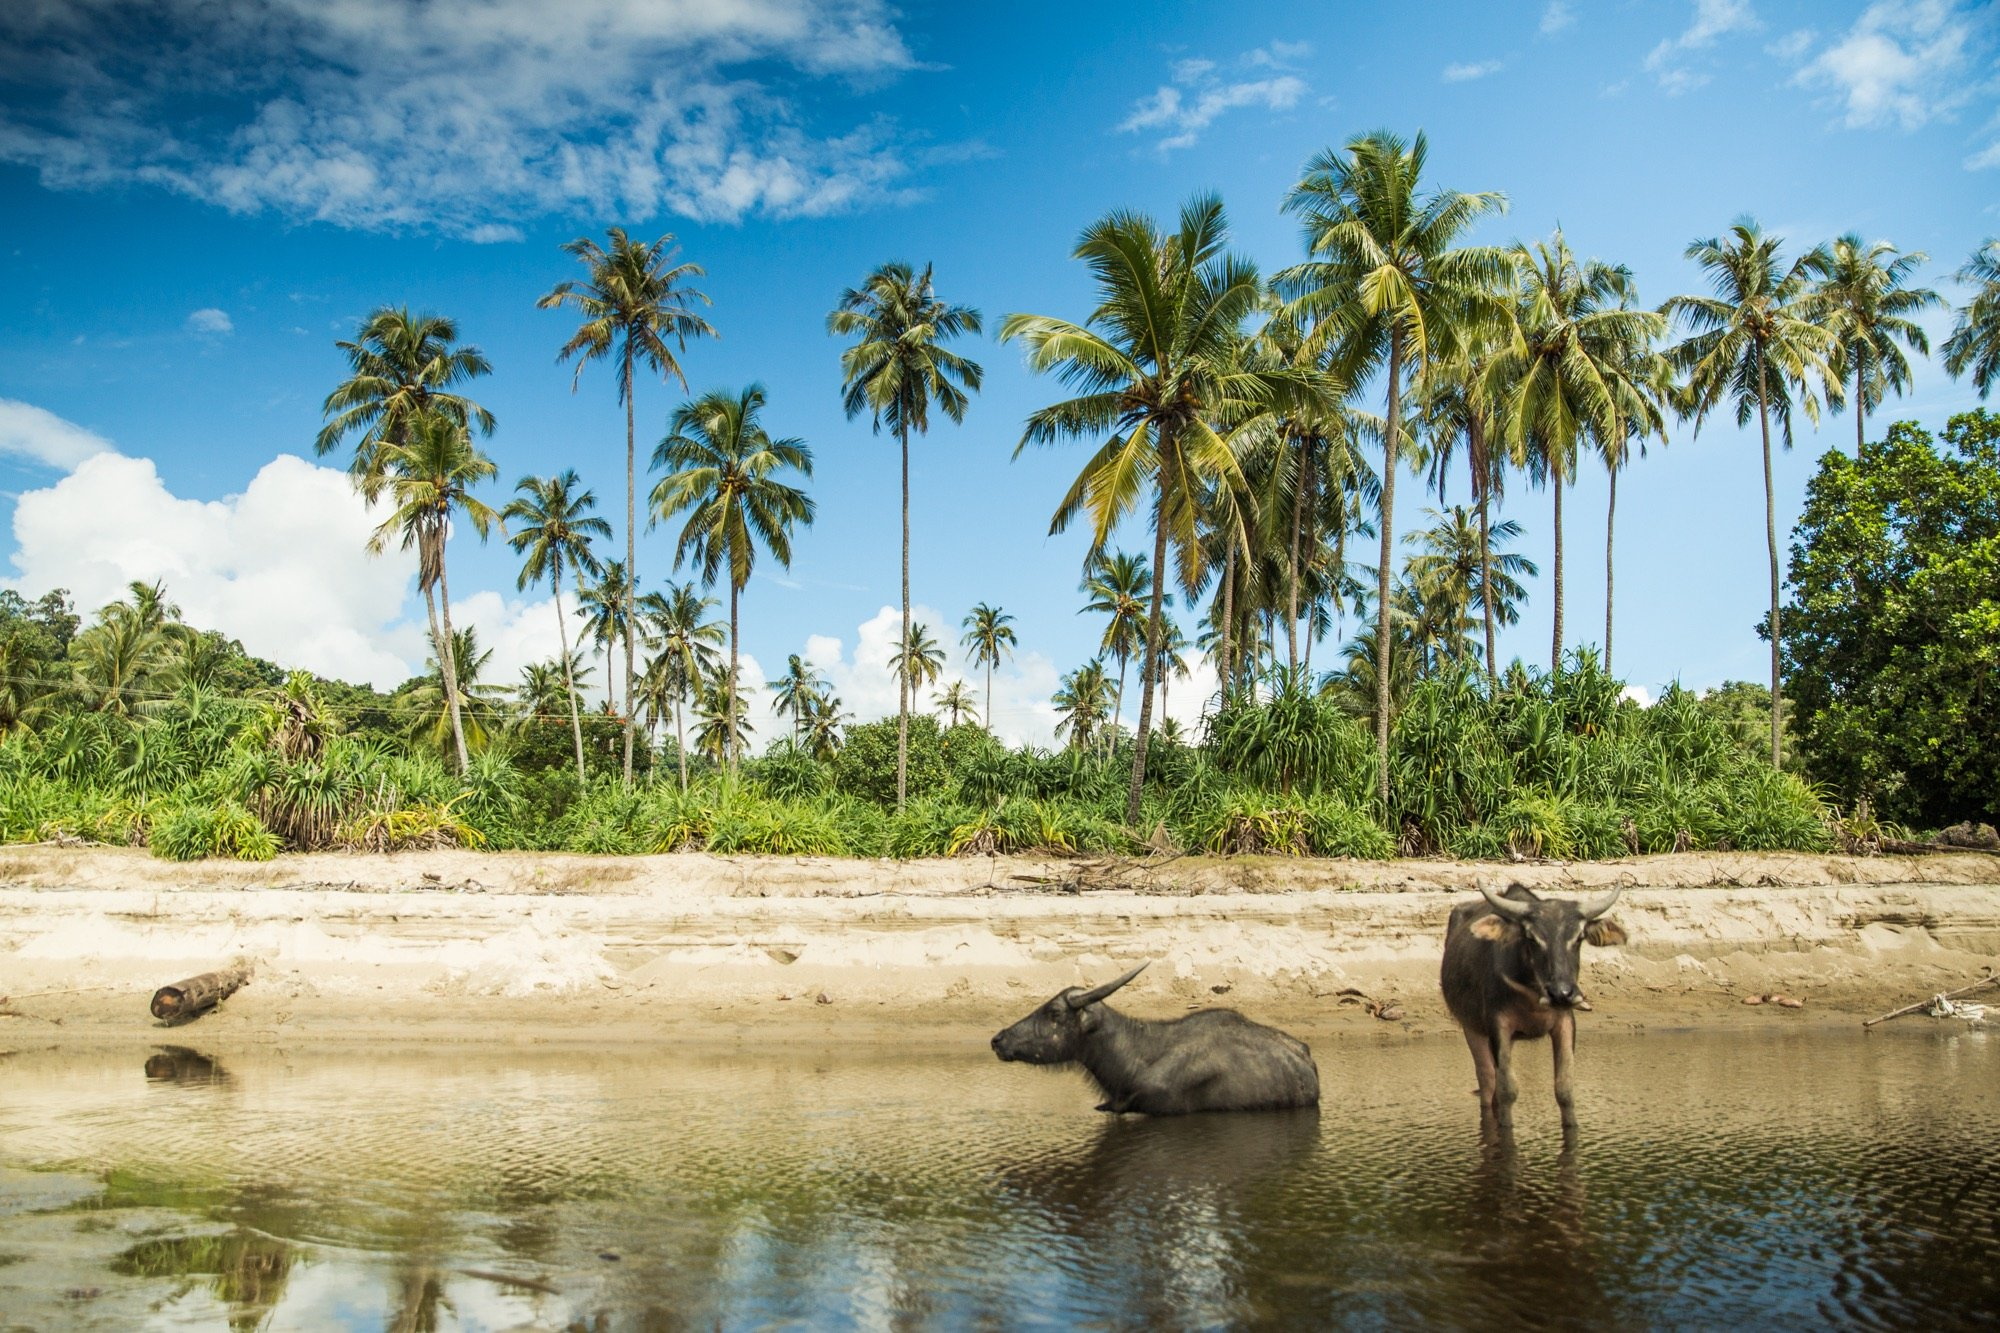 Sumatran buffaloes on Simeulue Island